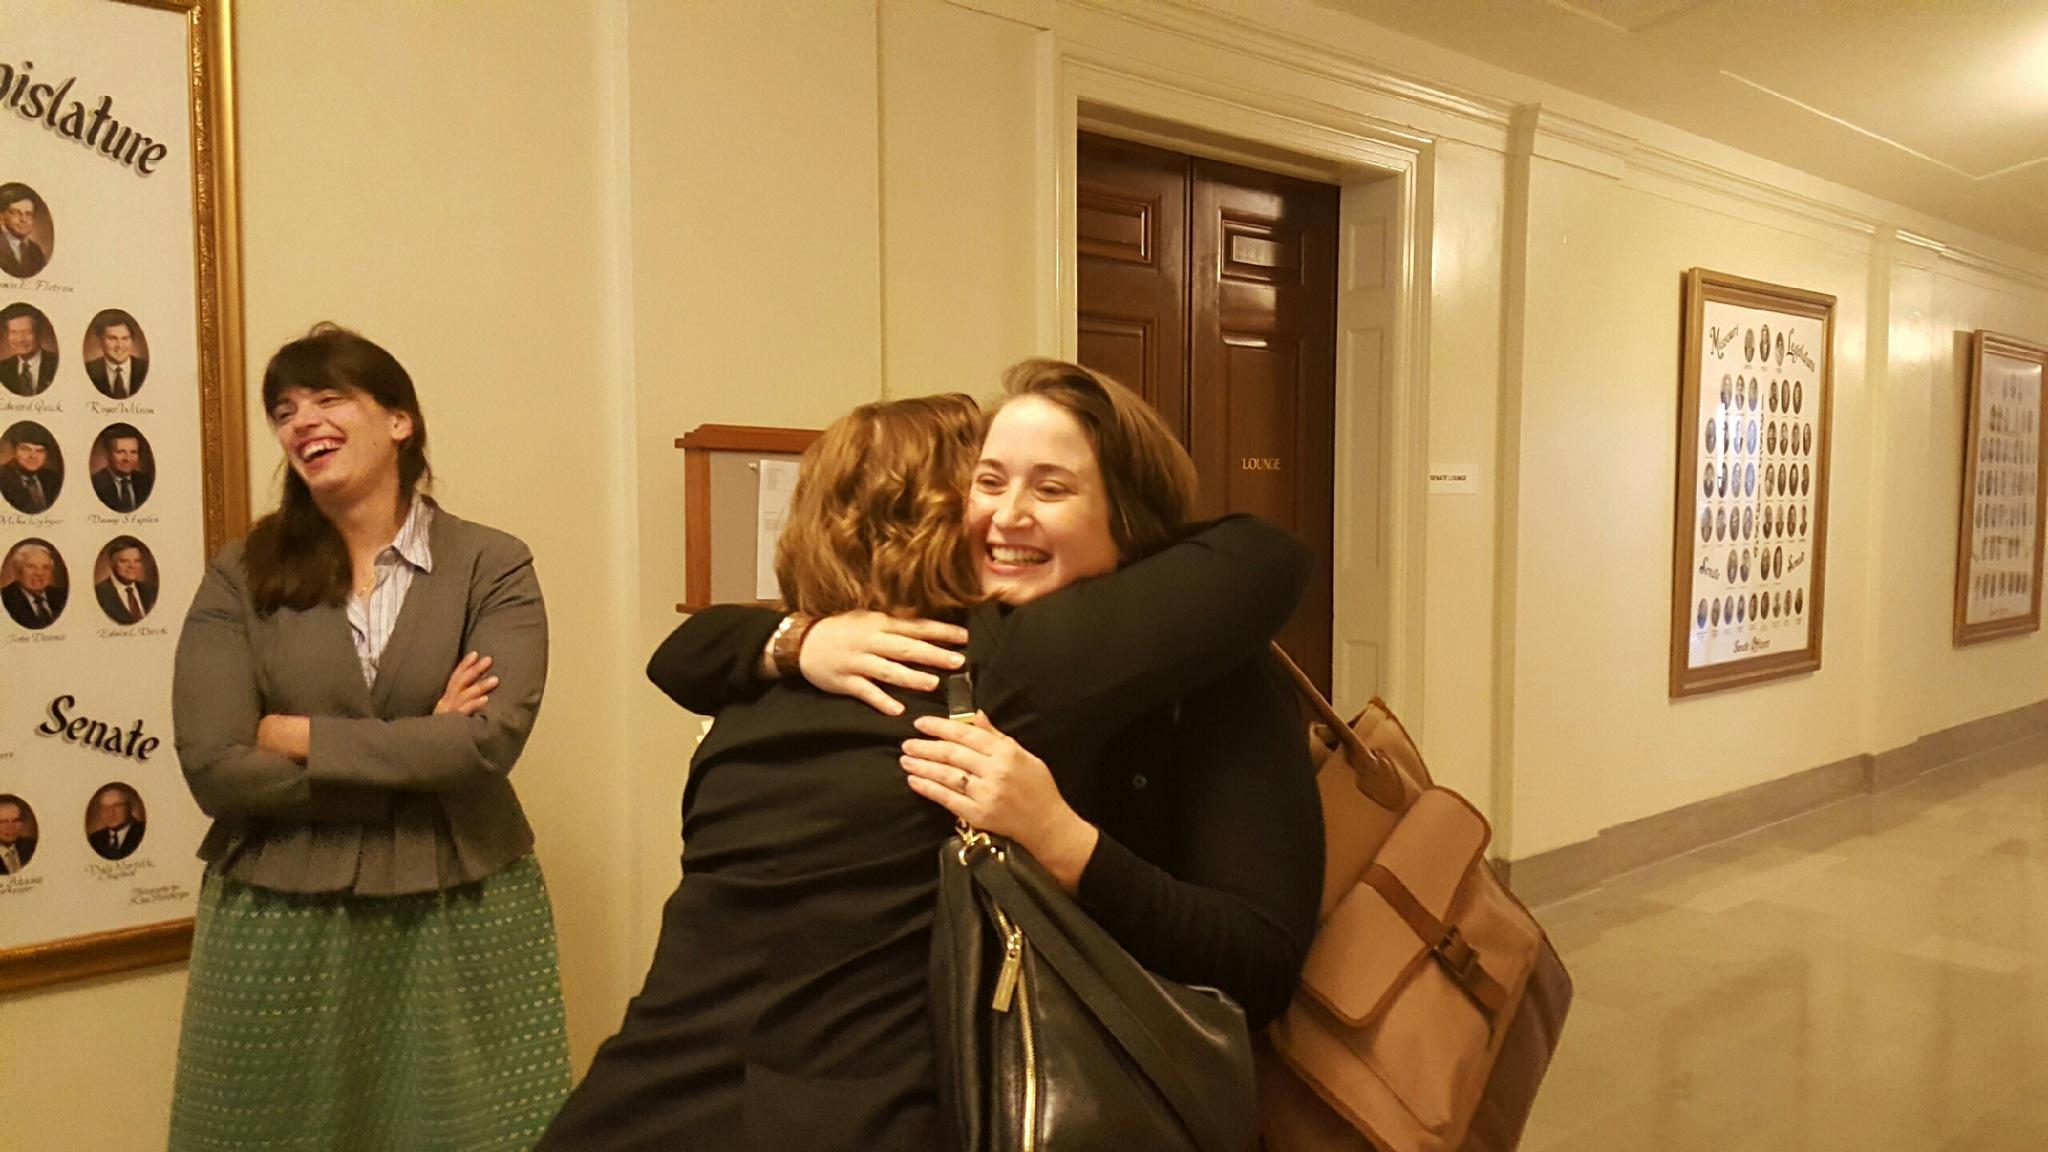 Meeting the amazing Rachel Goldberg! Photo by M'Evie Mead.